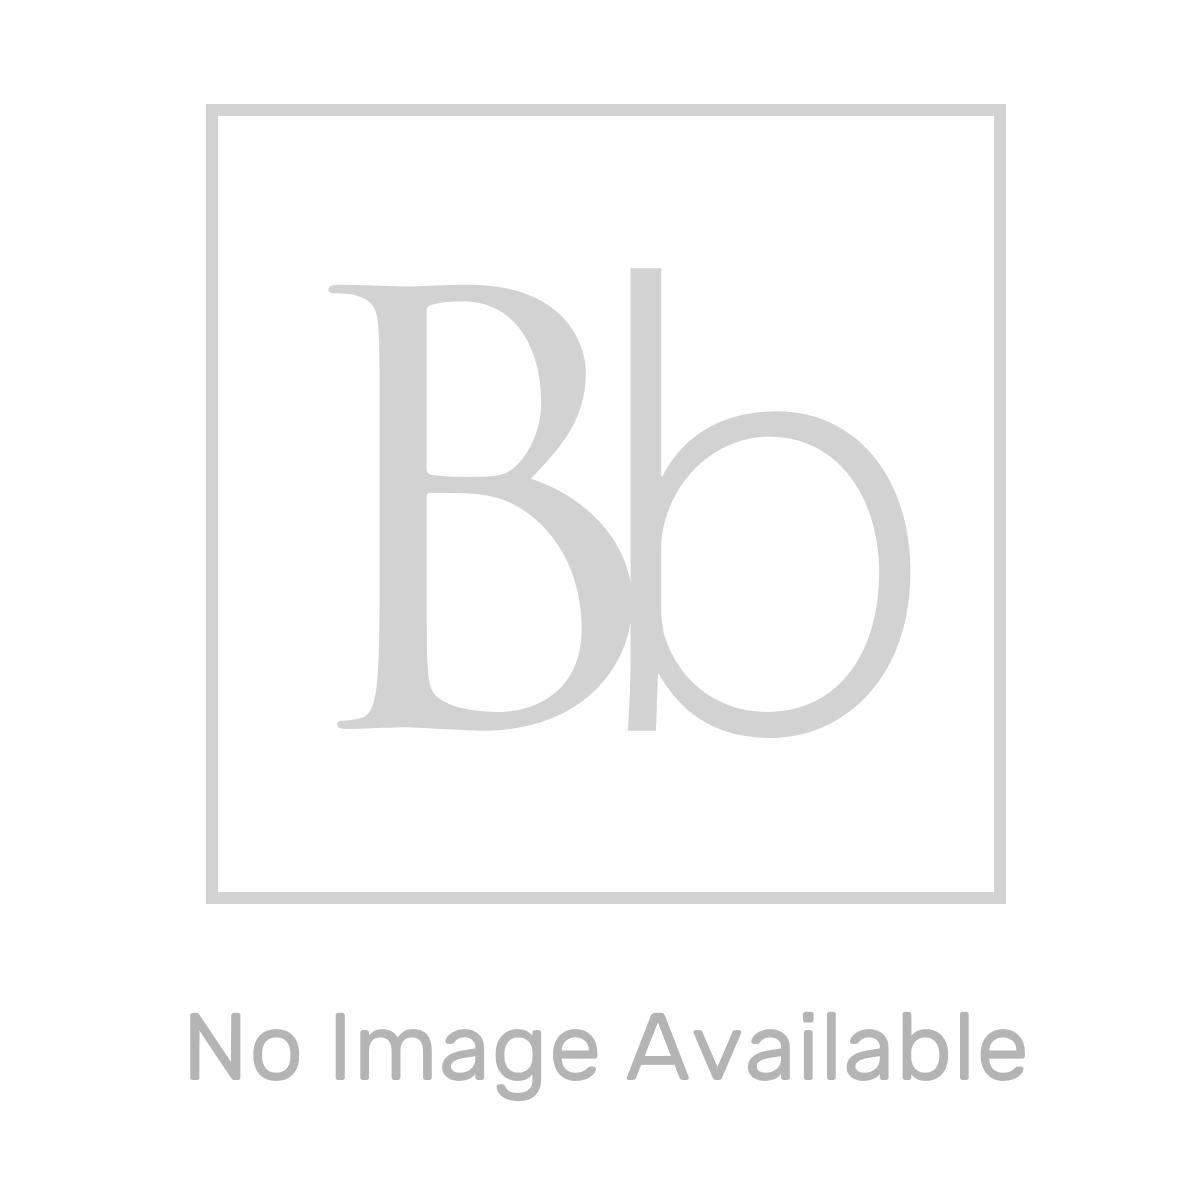 Merlyn MStone Offset Quadrant Shower Tray Left Hand 900 x 760mm